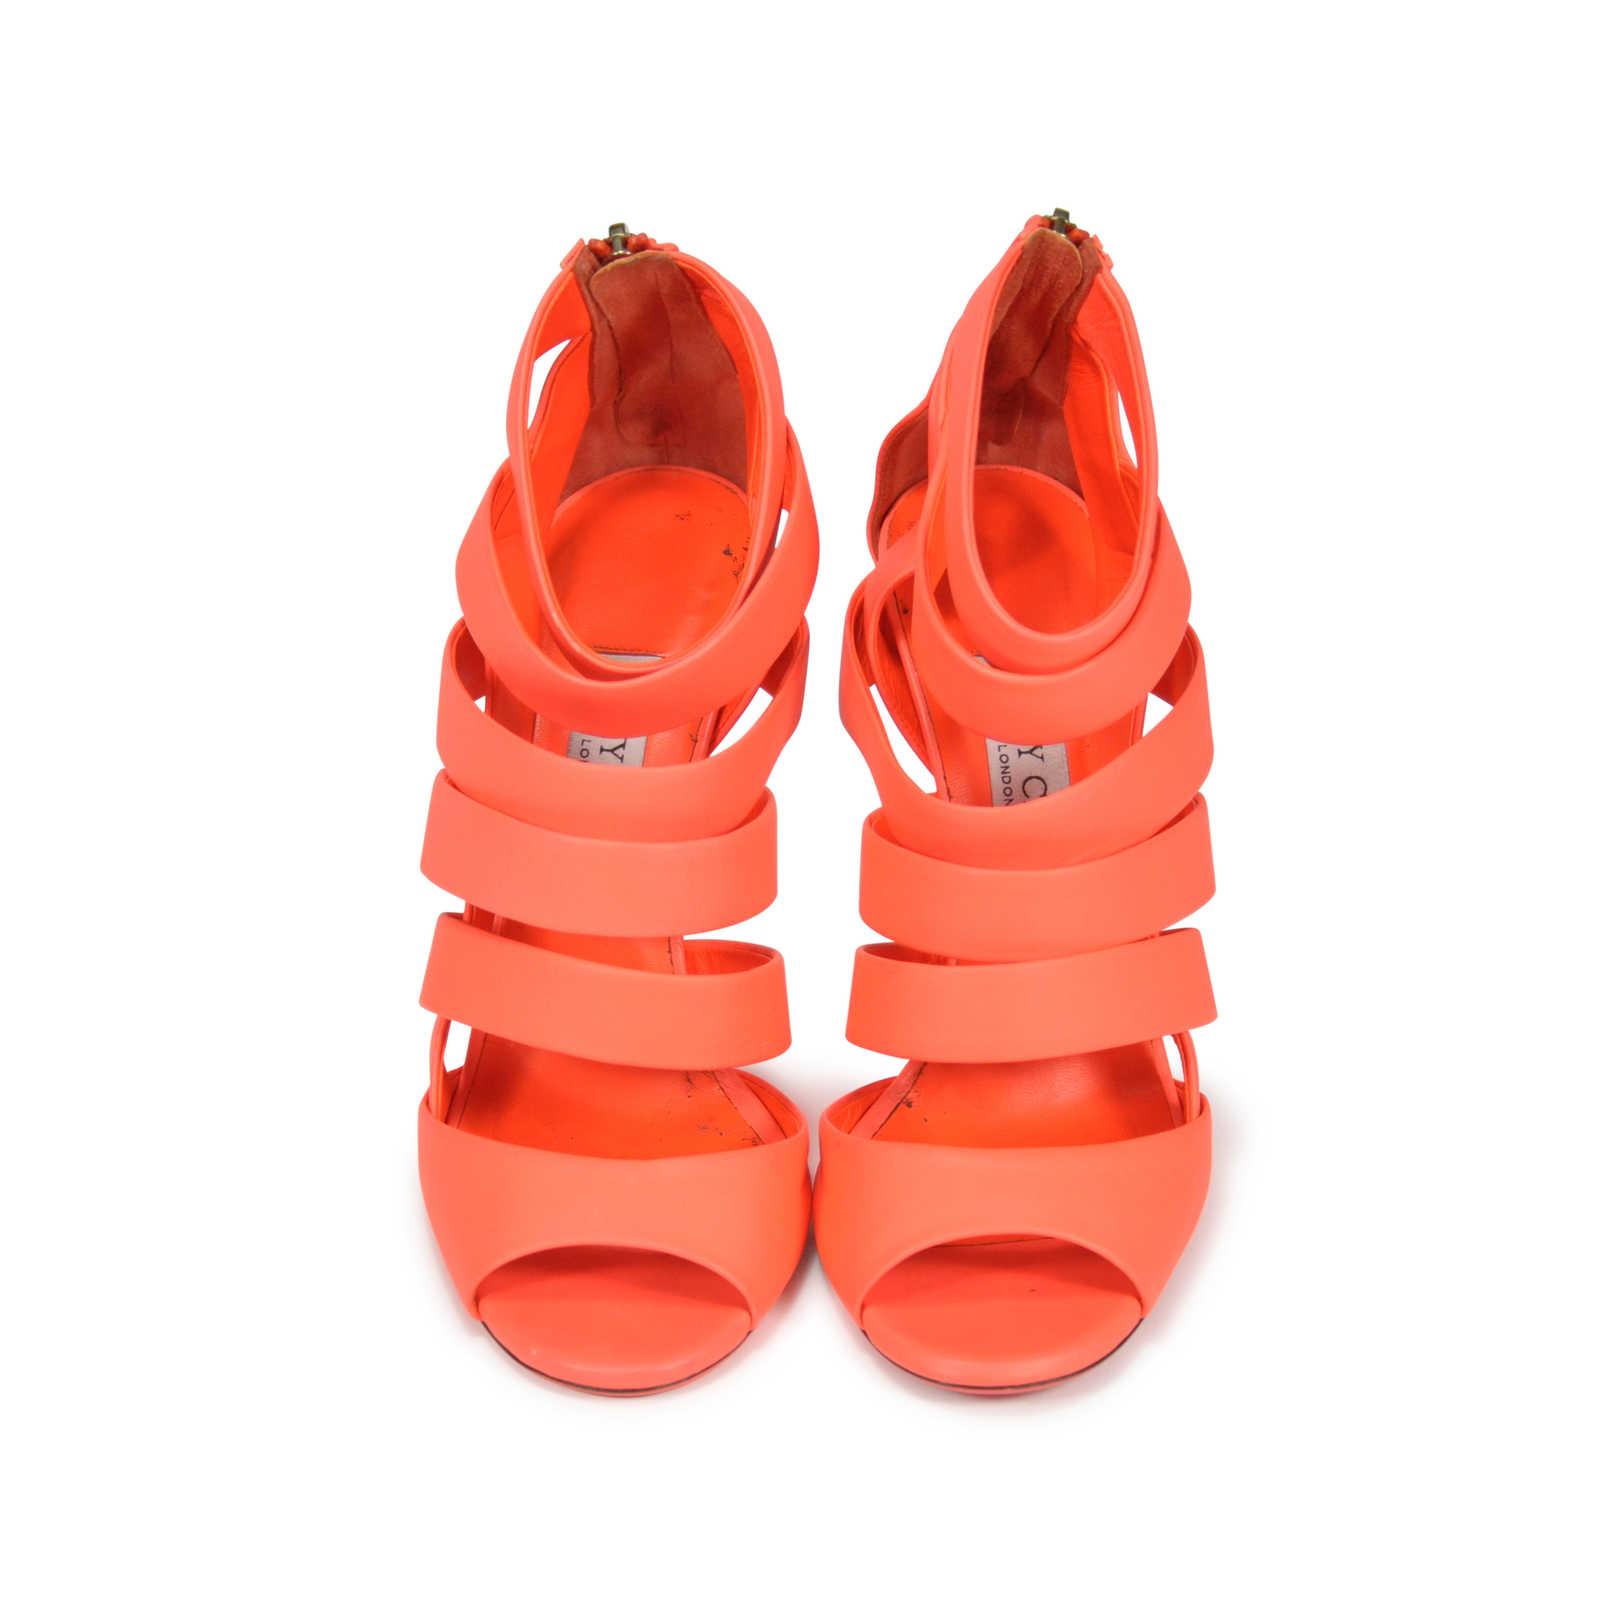 jimmy-choo-damsen-neon-flame-nappa-leather-sandals-1.jpg